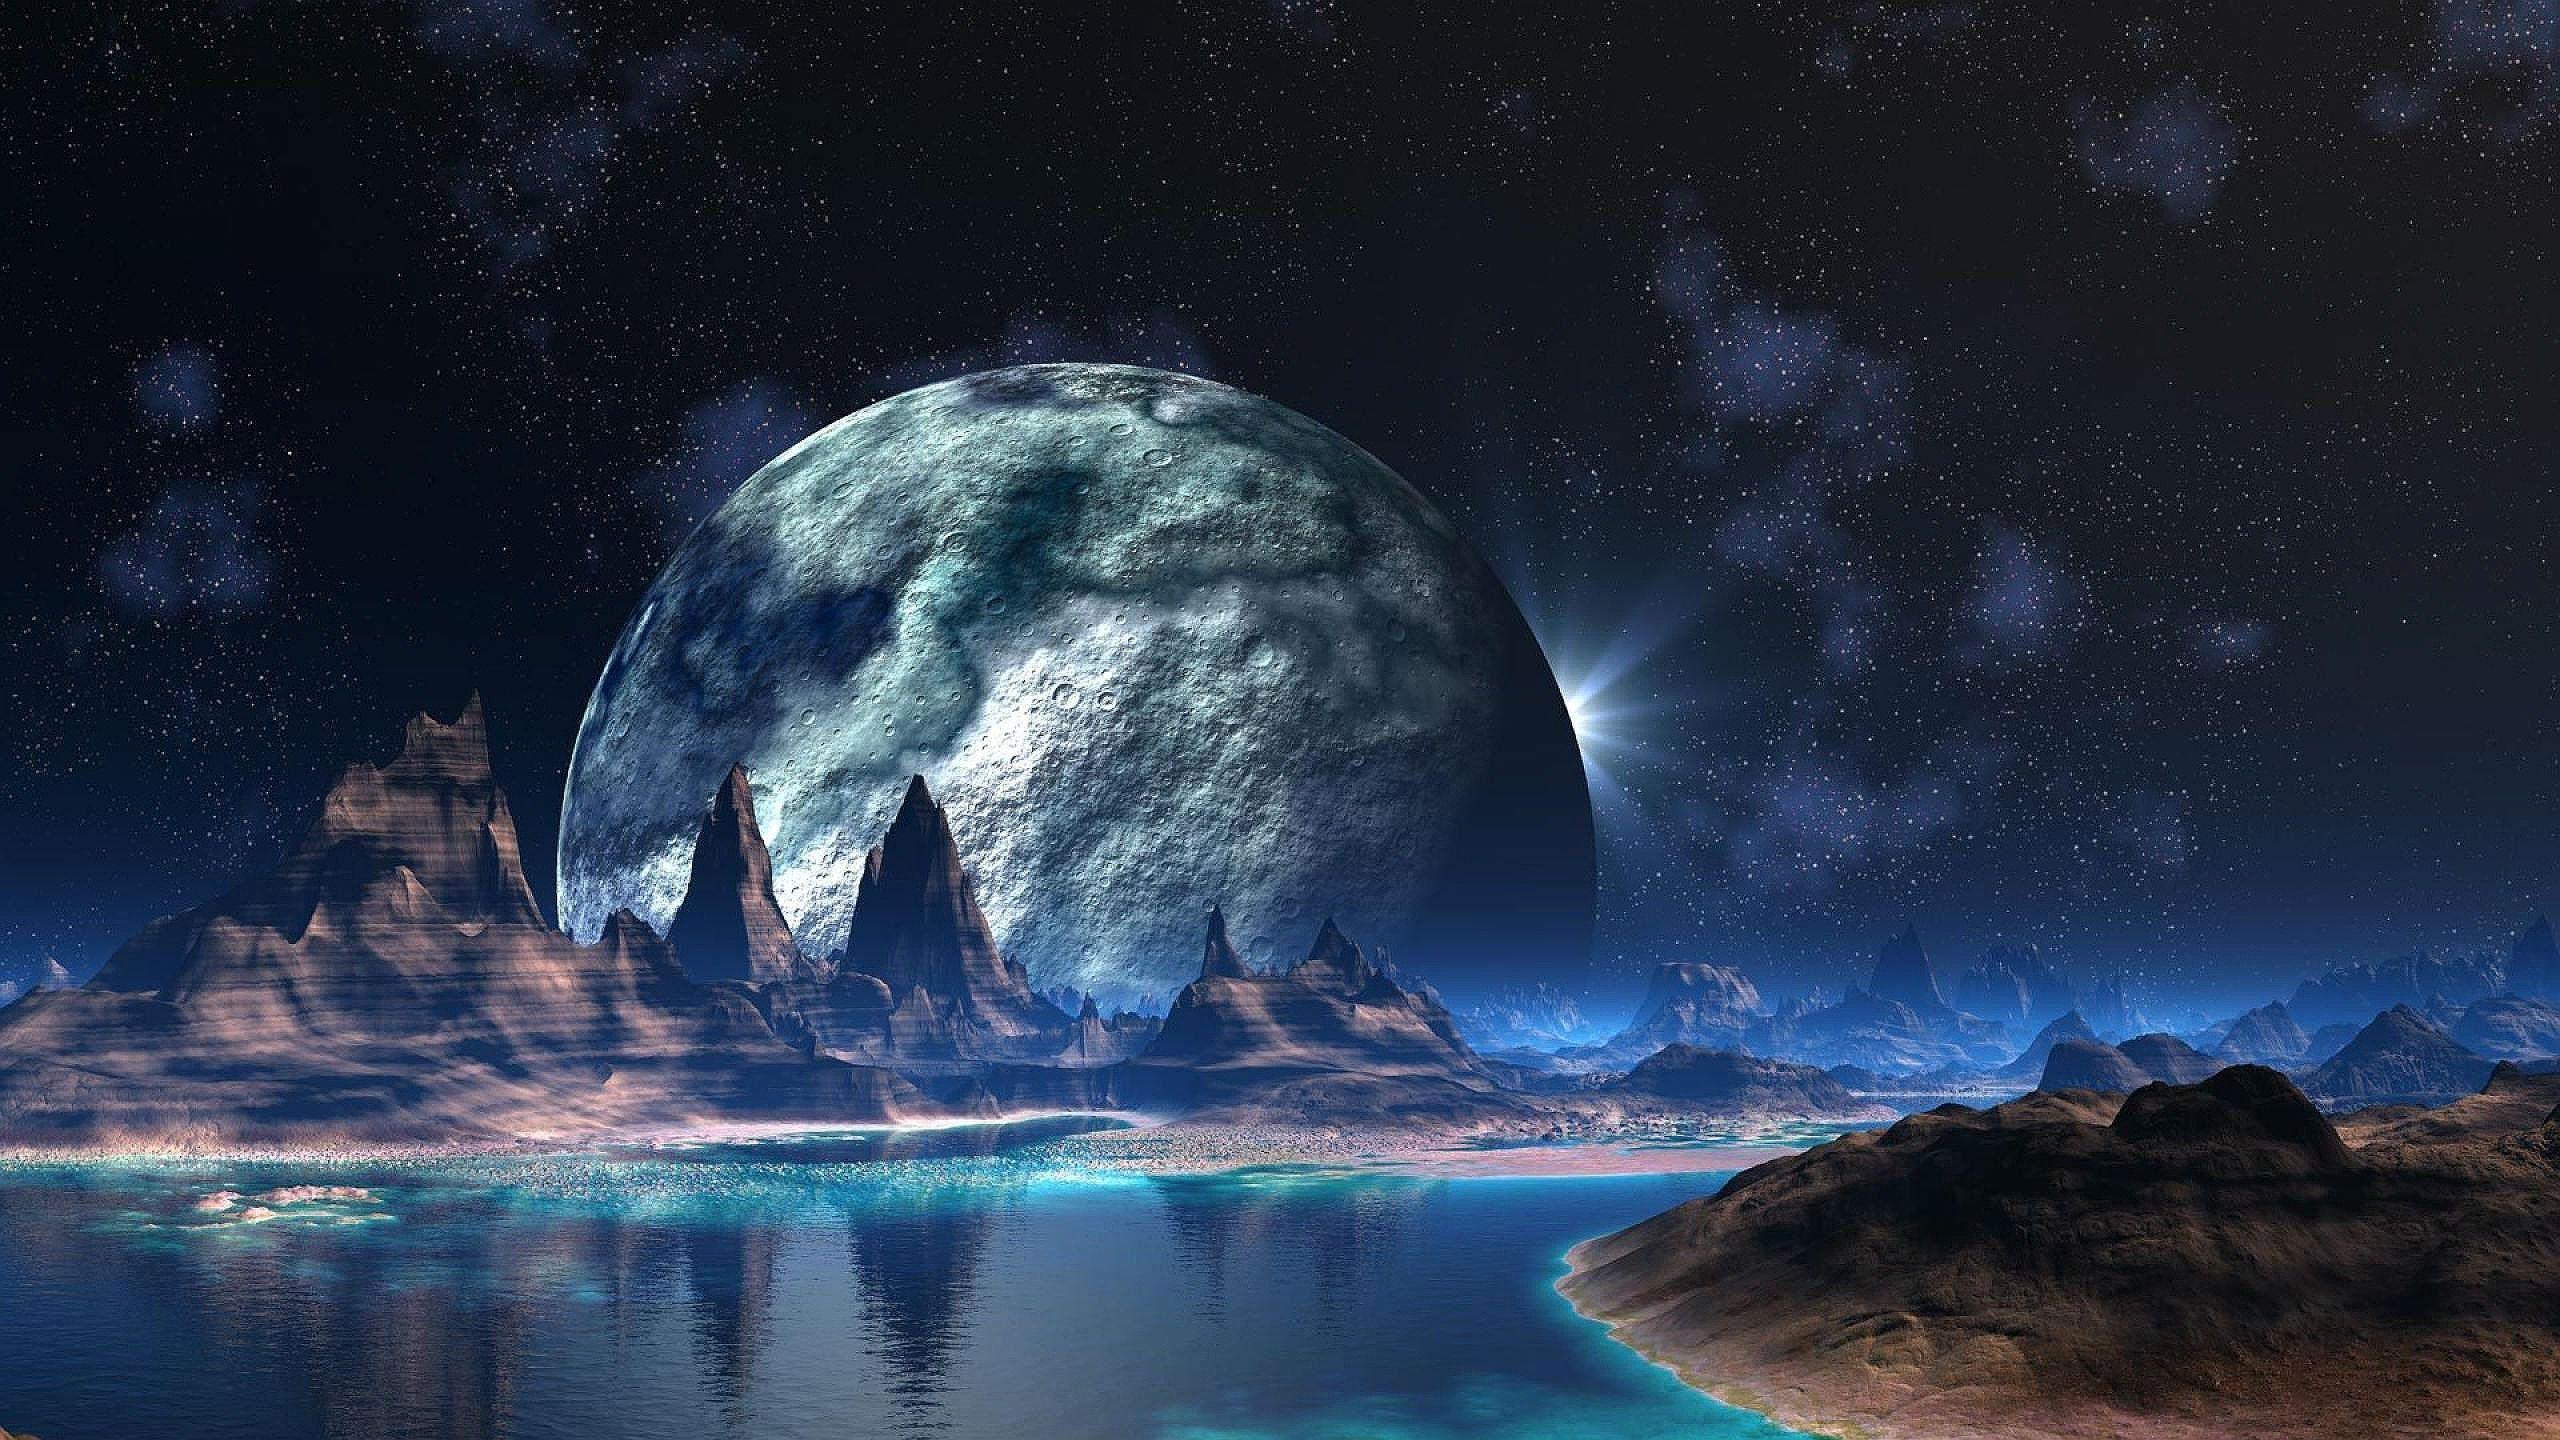 Alien Planet Wallpaper 2560x1440 Planets Wallpaper Wallpaper Earth Really Cool Backgrounds